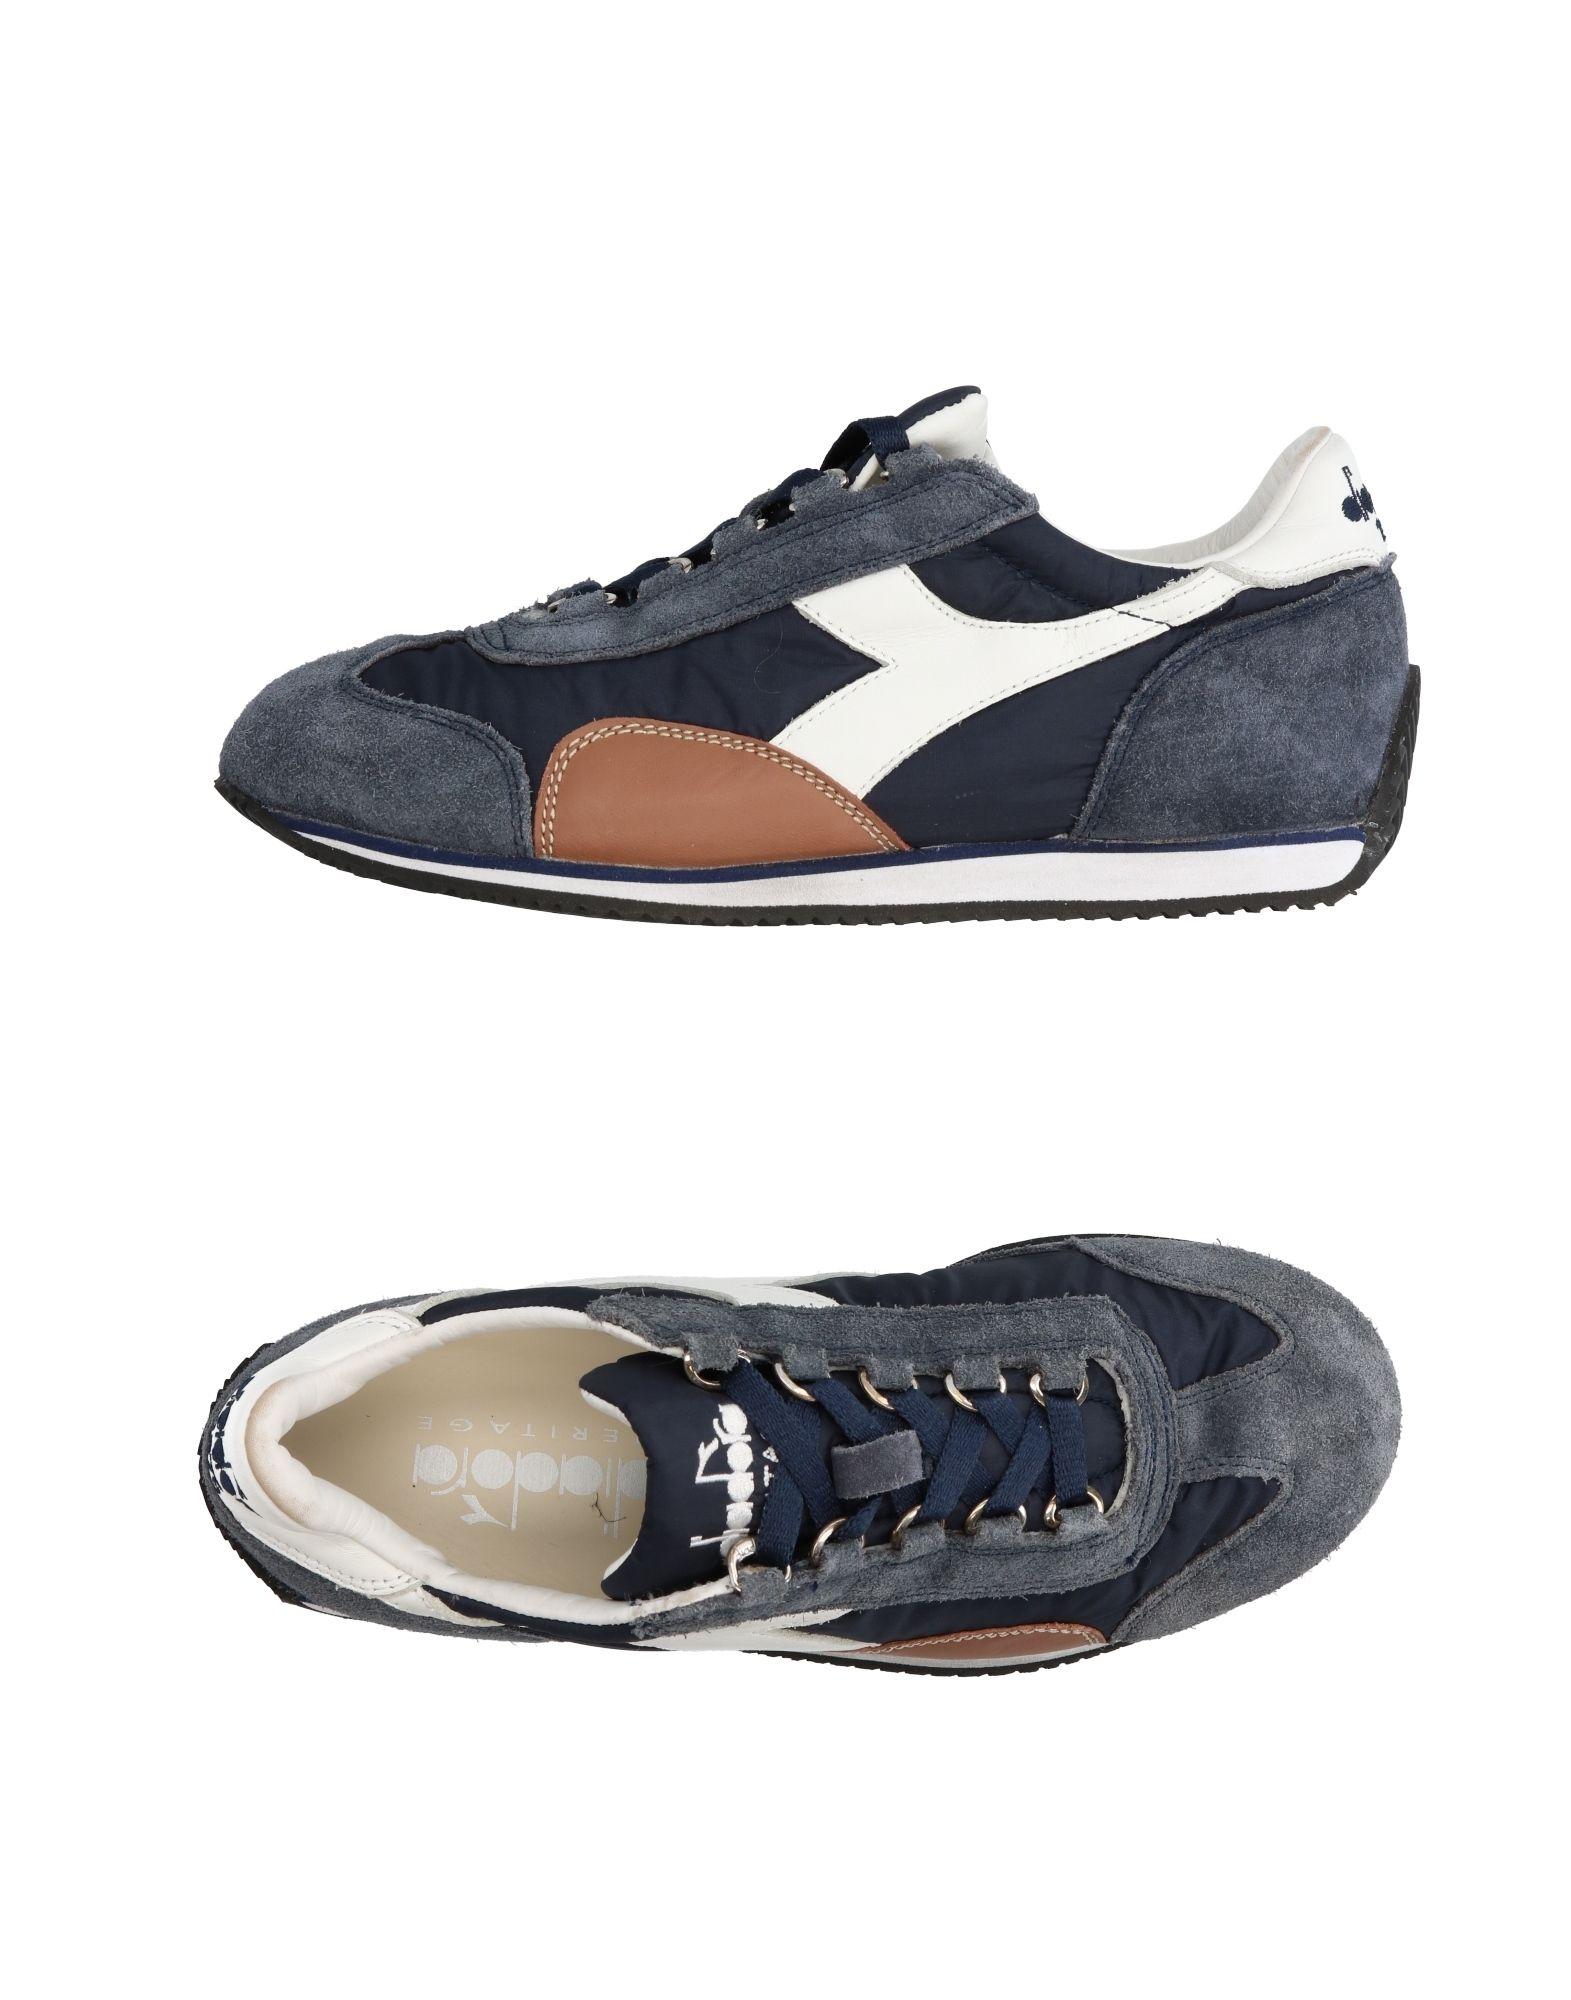 Diadora Heritage Heritage Diadora Sneakers Damen  11289165UU Gute Qualität beliebte Schuhe a48785